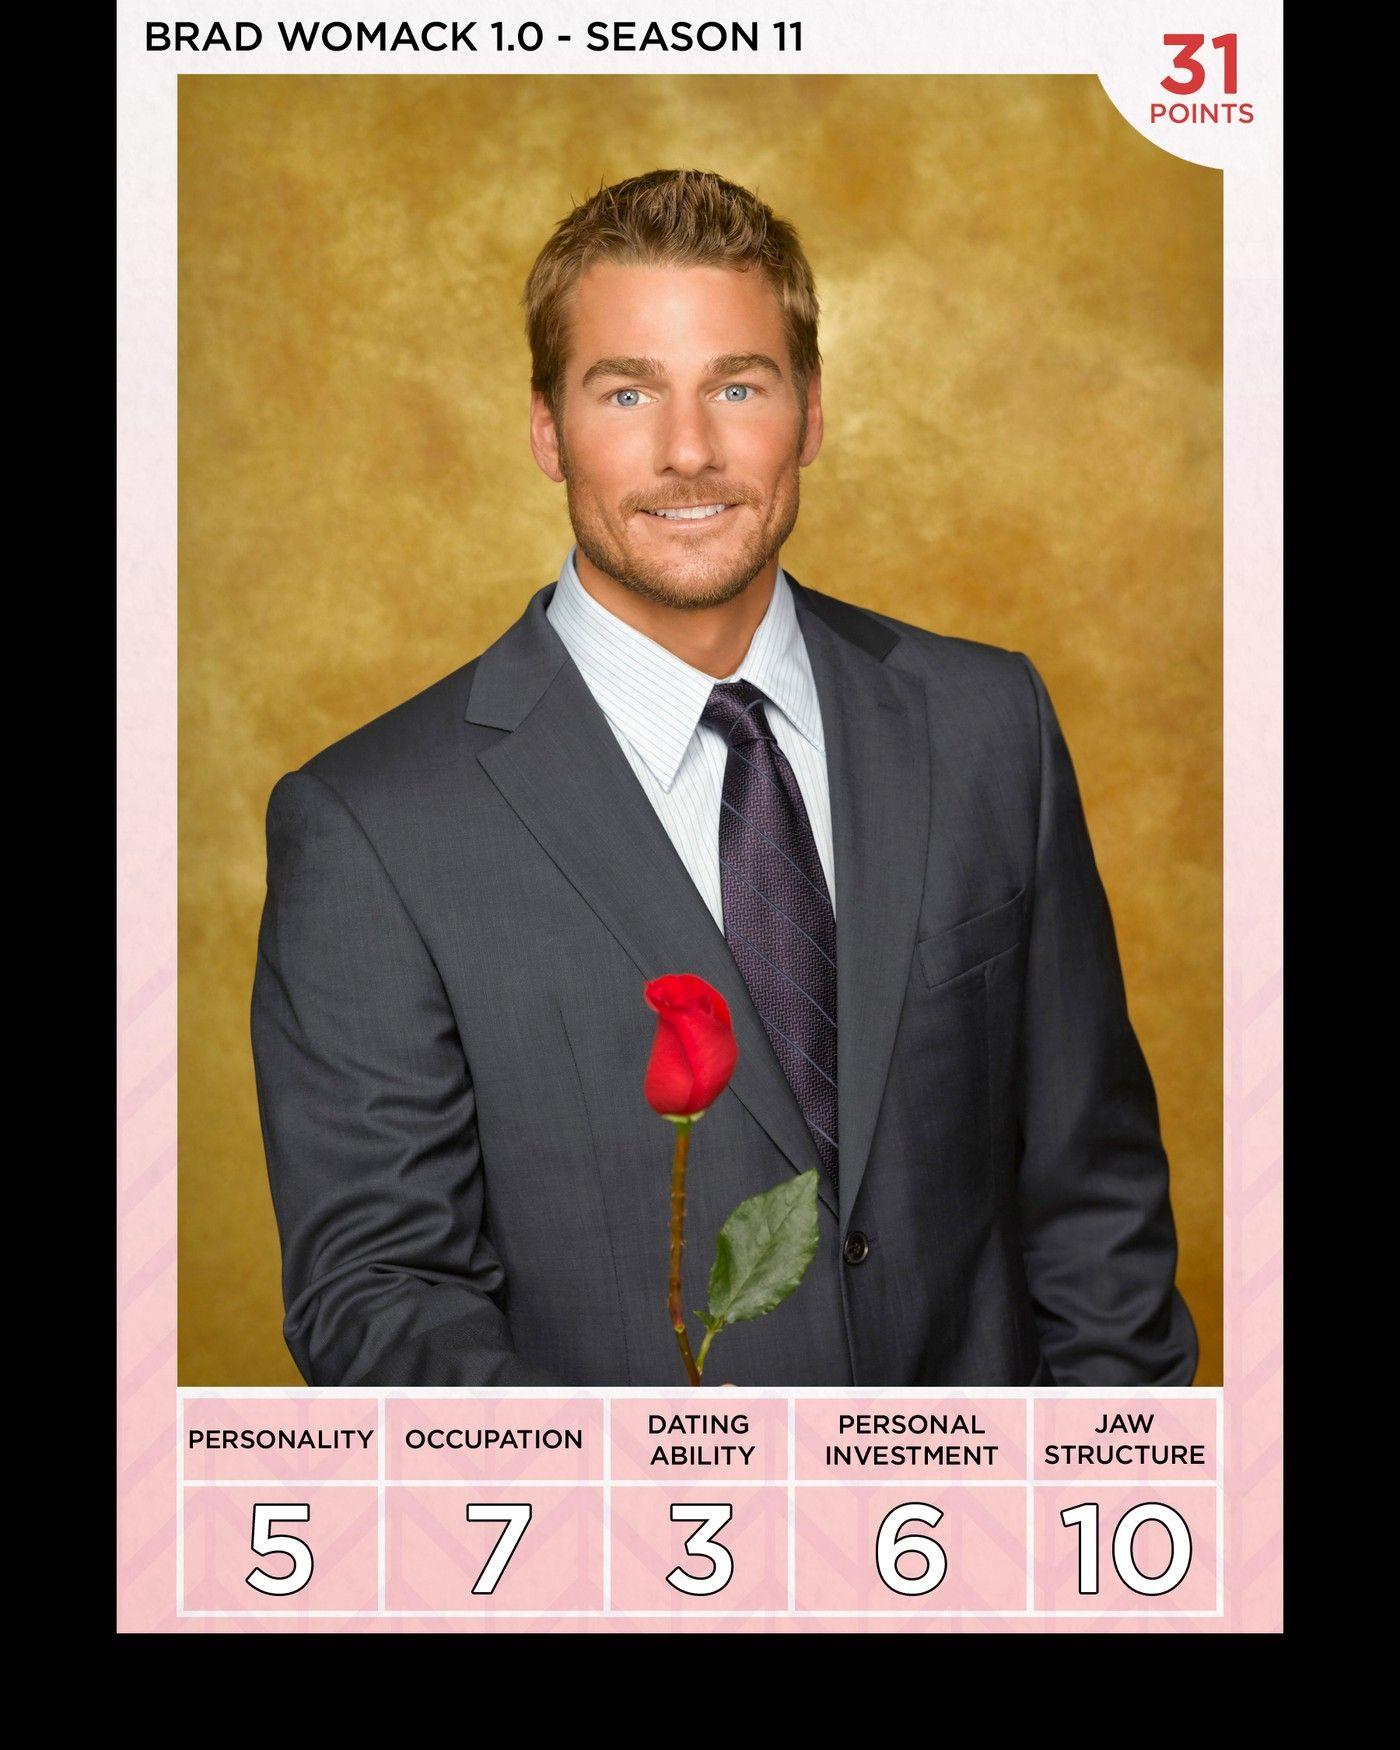 Scott disick dating liste